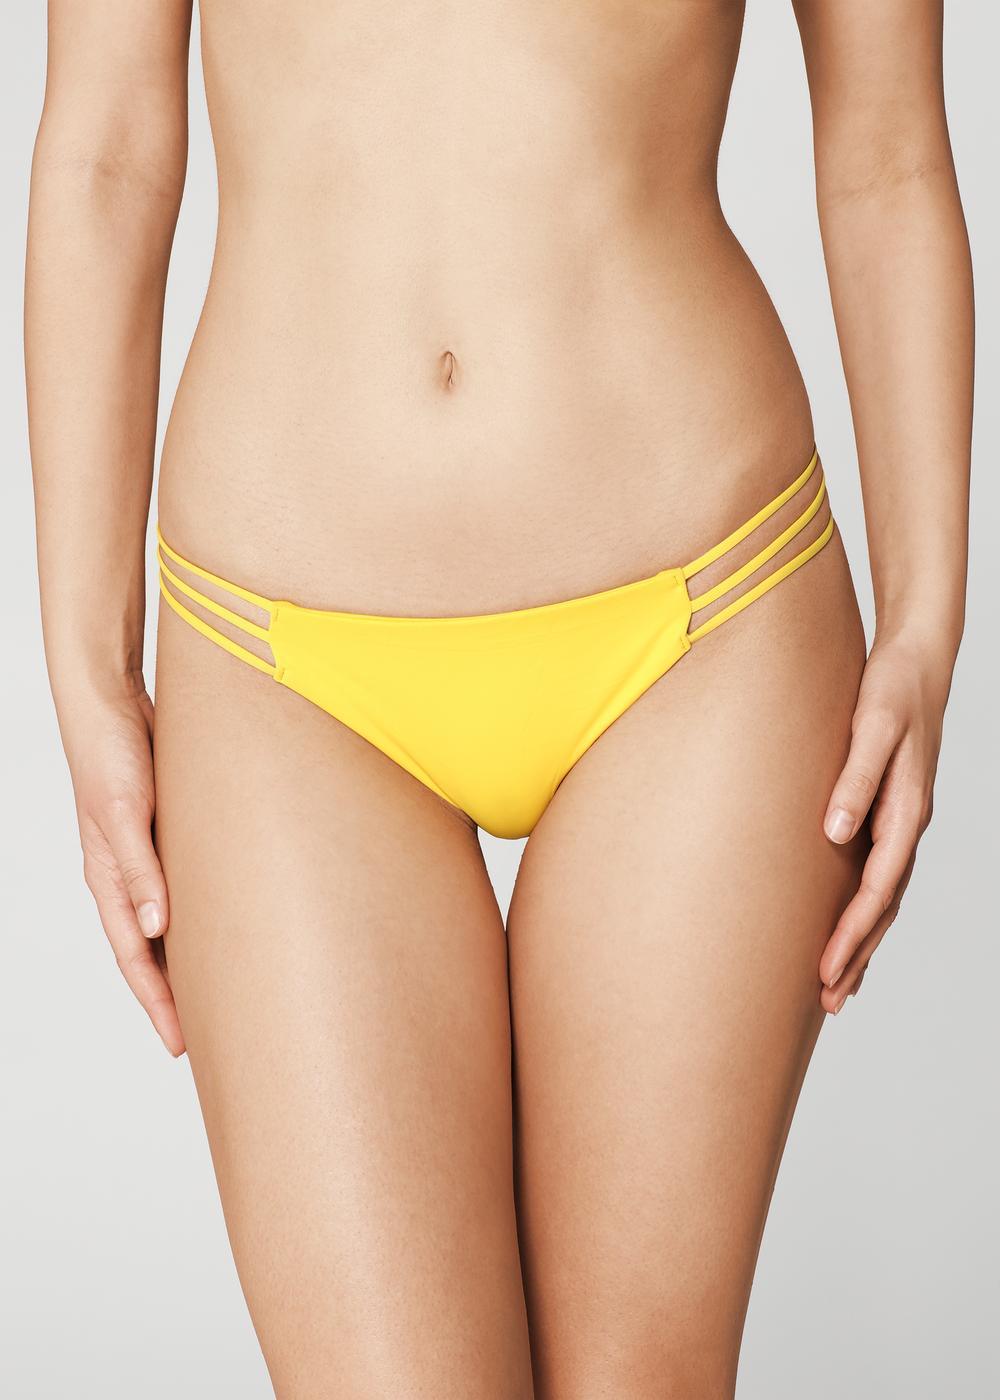 808f2f15c2b1 Slip Bikini Brasiliano Indonesia